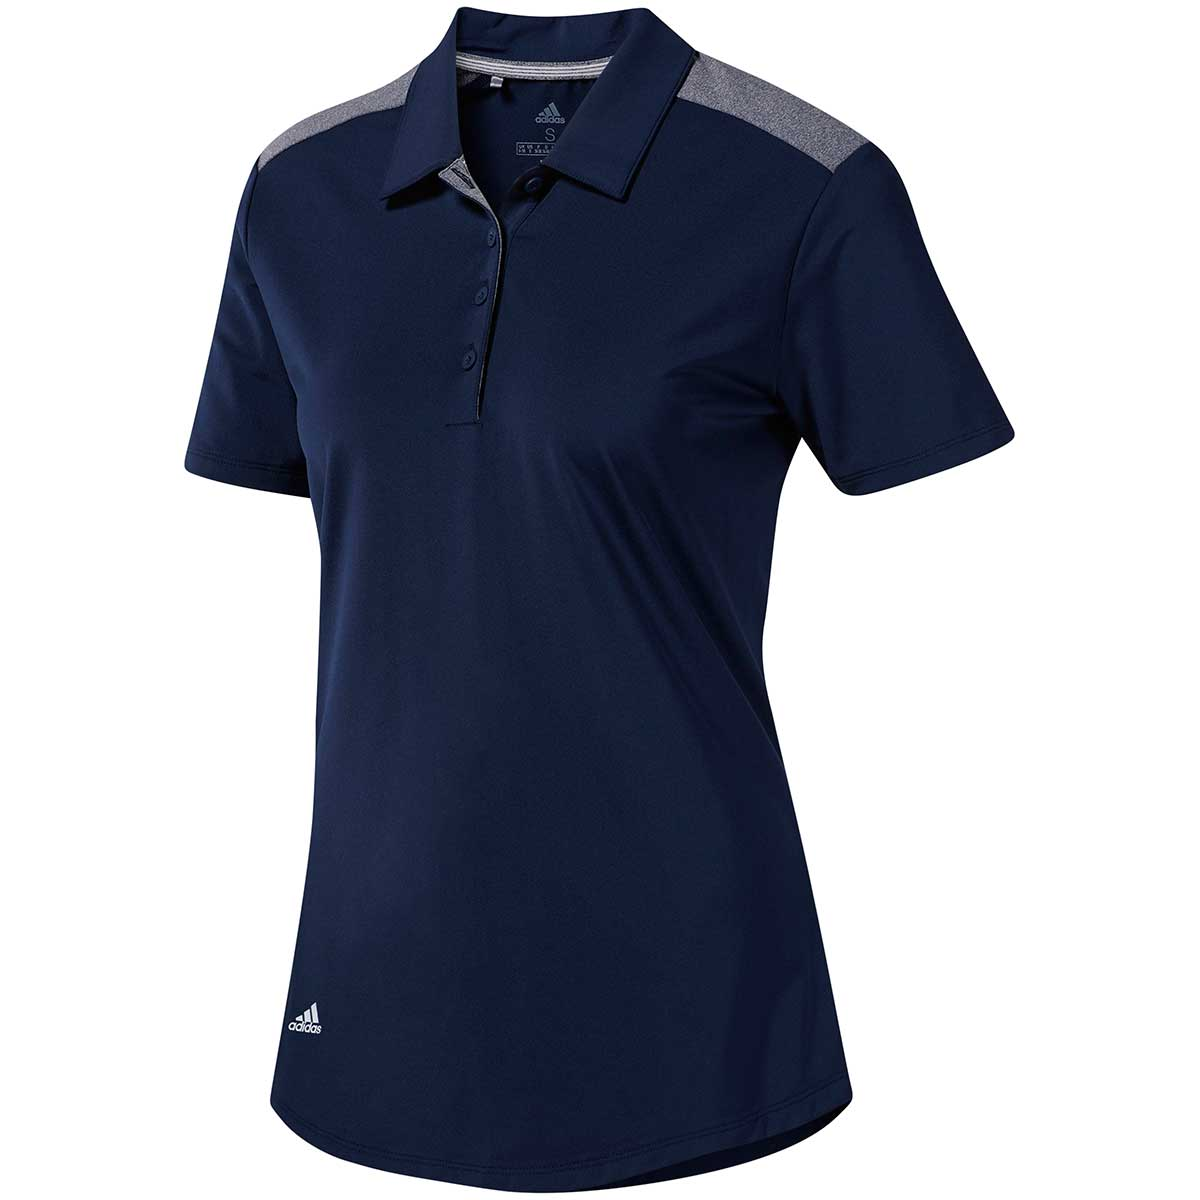 Adidas Women's Ultimate365 Polo Shirt - Night Indigo